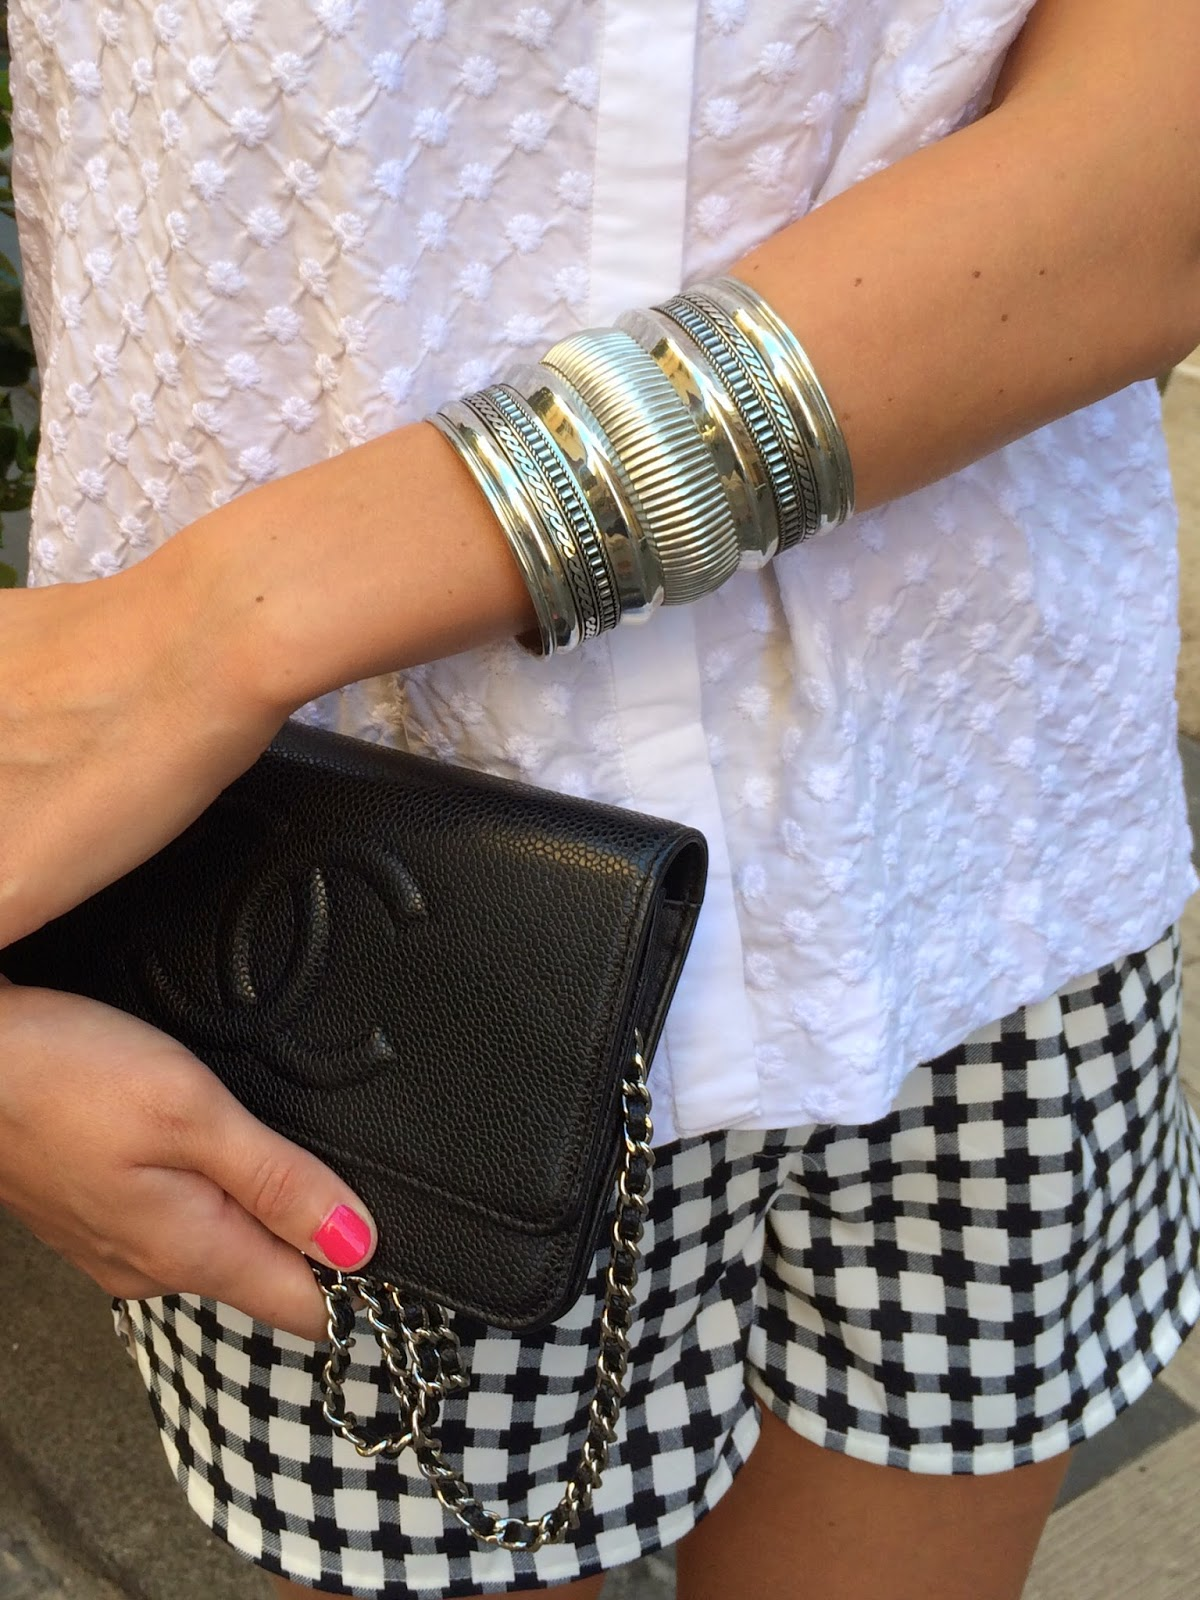 silver cuff, silver bracelet, chanel clutch, wallet on chain, chanel bag, zara shorts, gap shirt, white shirt, pink nails, pink nail polish, dior nail polish, dior plaza nail polish, checked shorts